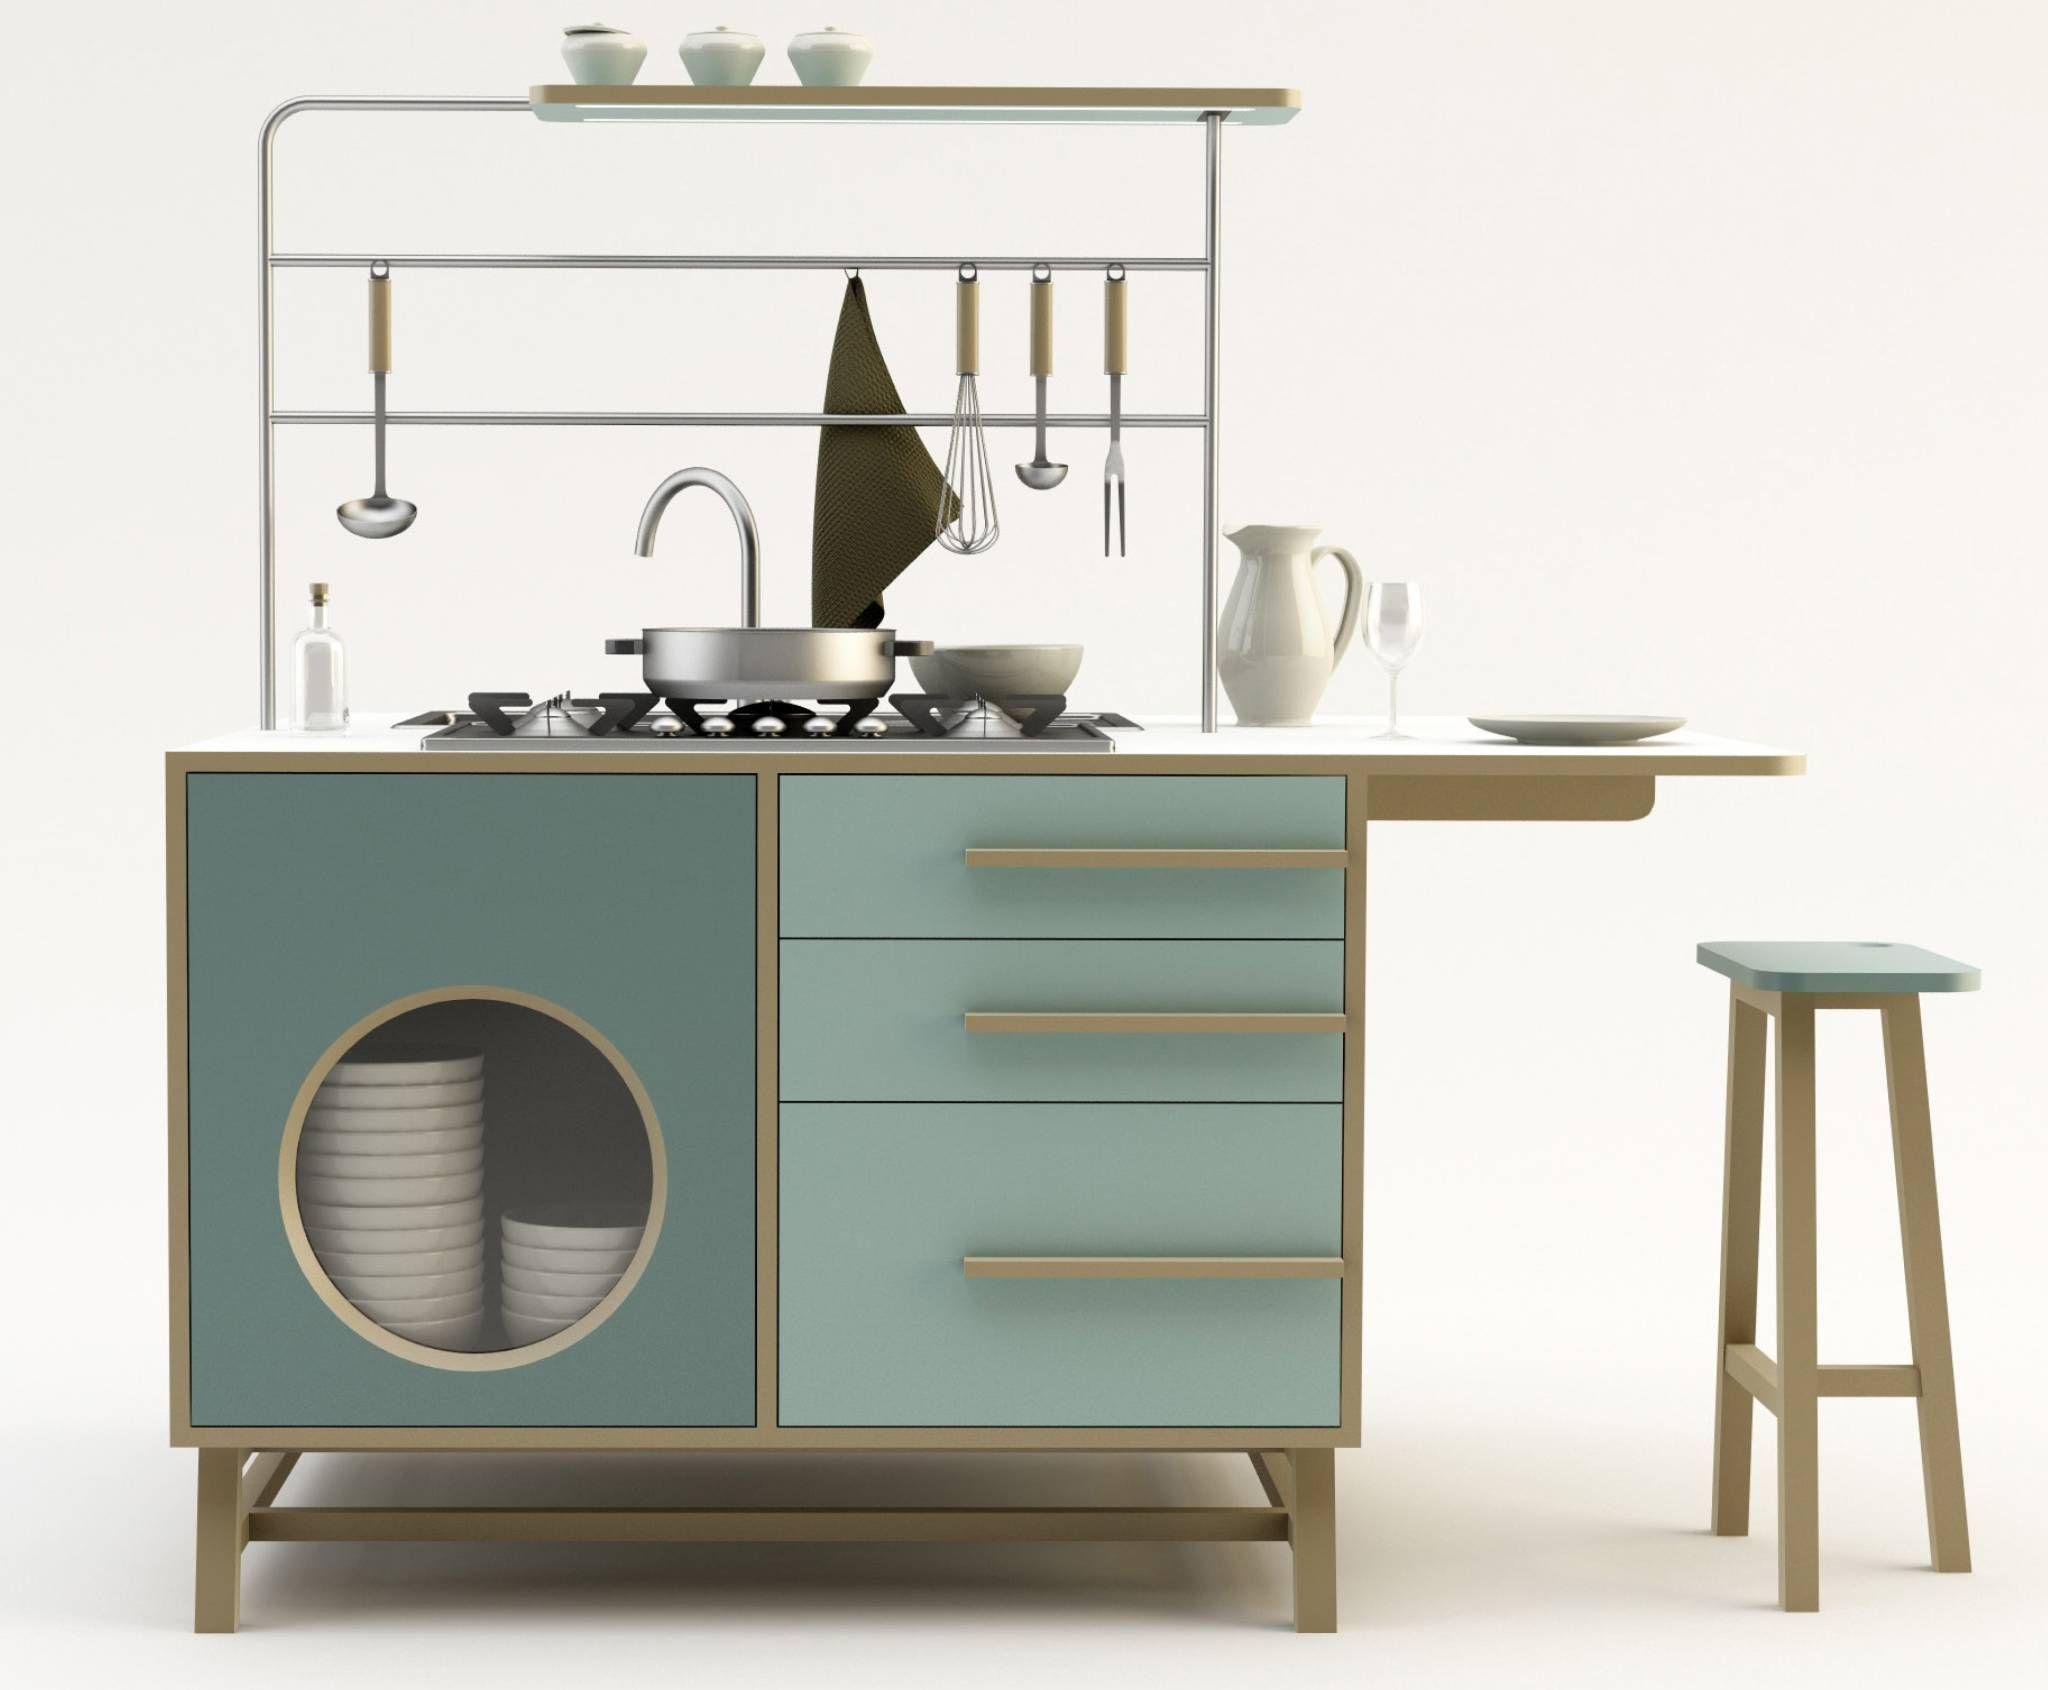 Monoblocco happy kitchen_design mood in stile industriale